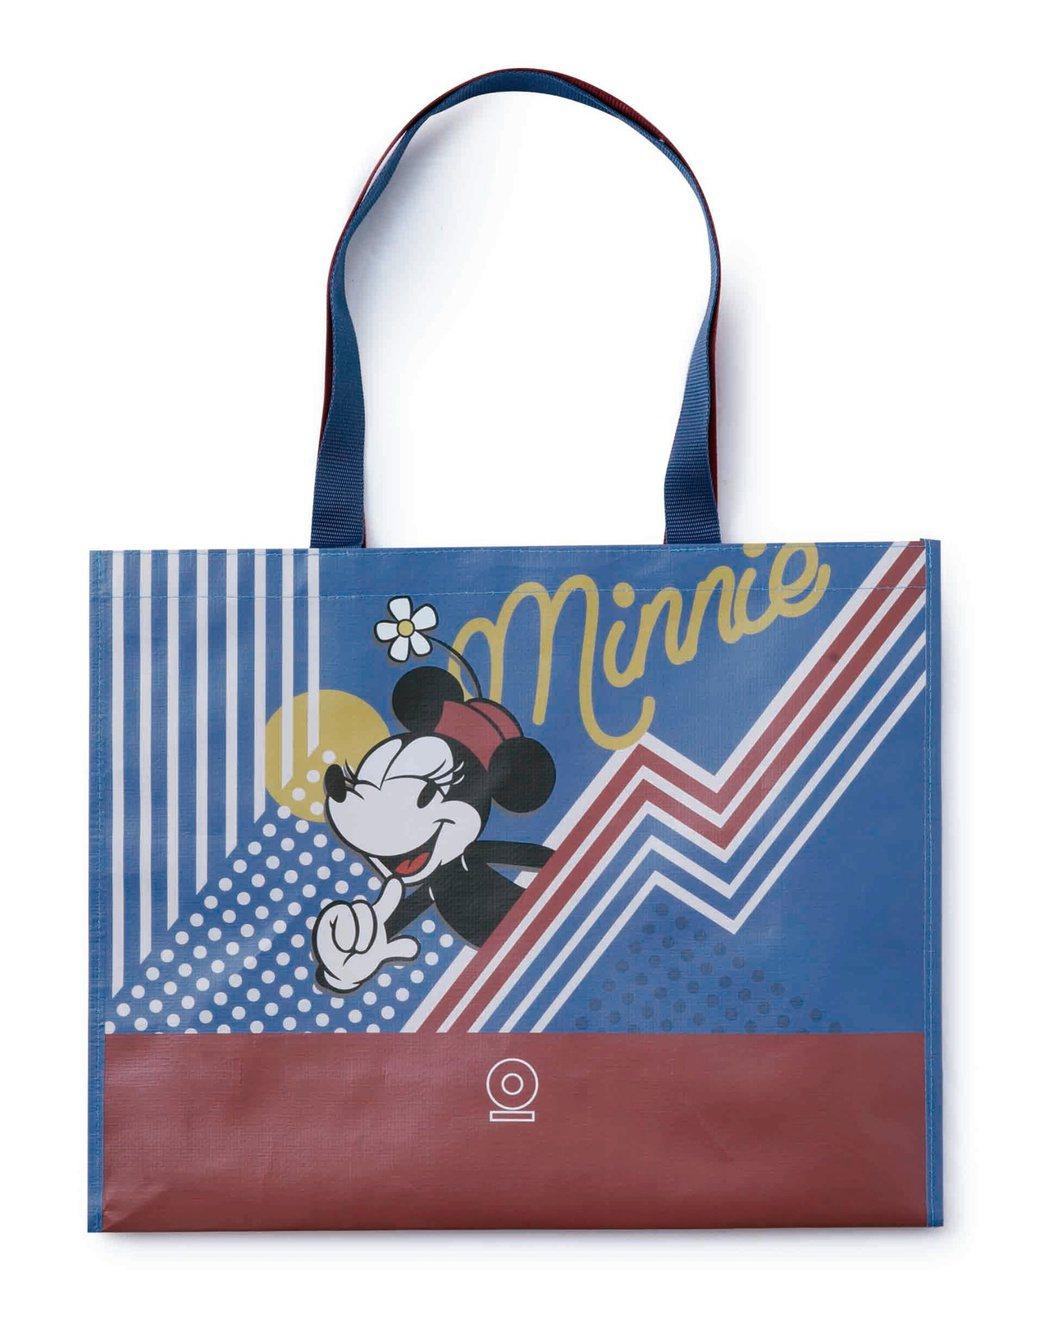 HOLA迪士尼系列米奇購物袋,原價499元、特價199元。圖/HOLA提供